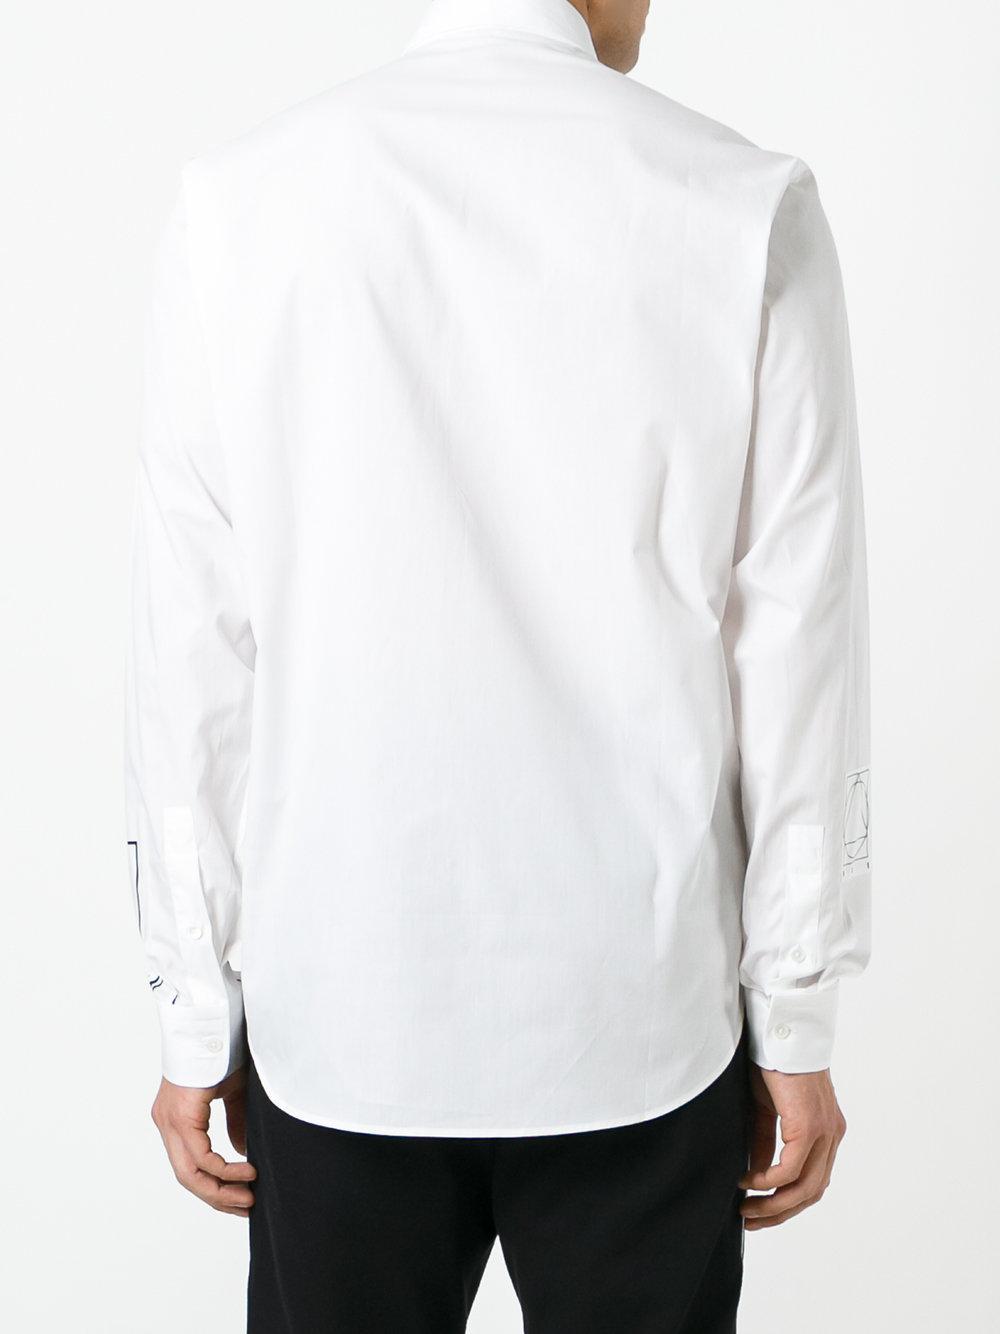 McQ Cotton Optic White Shirt for Men